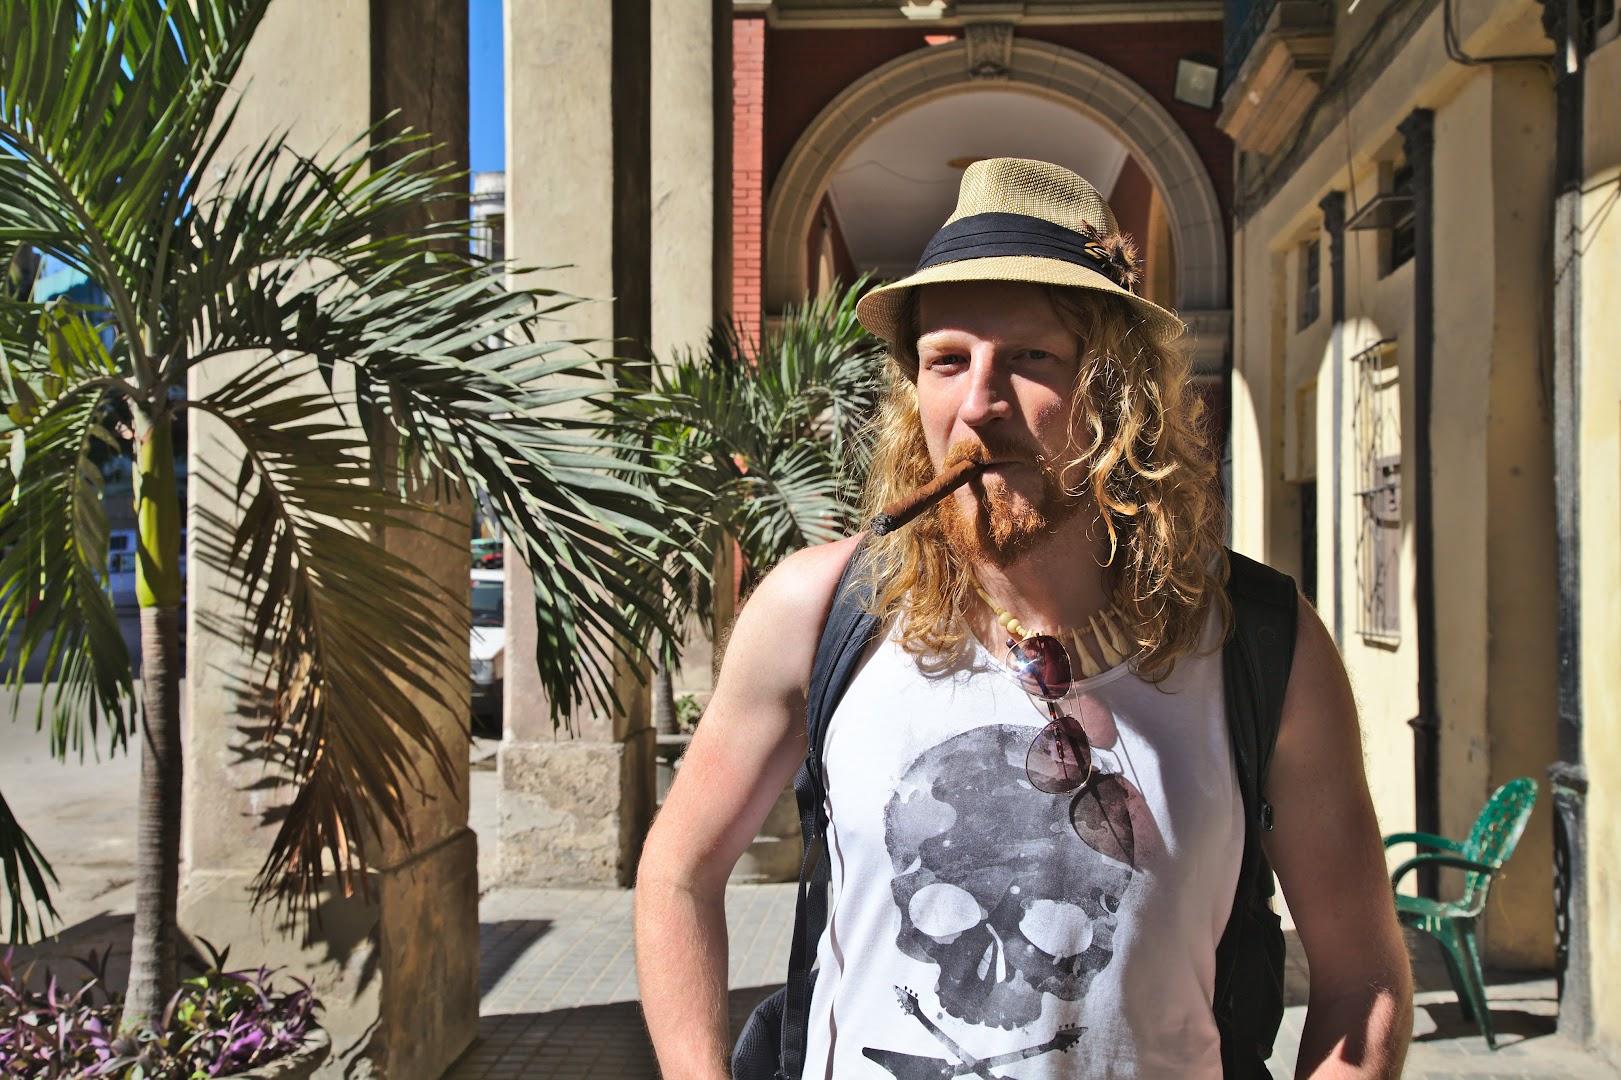 Mocking a Cuban